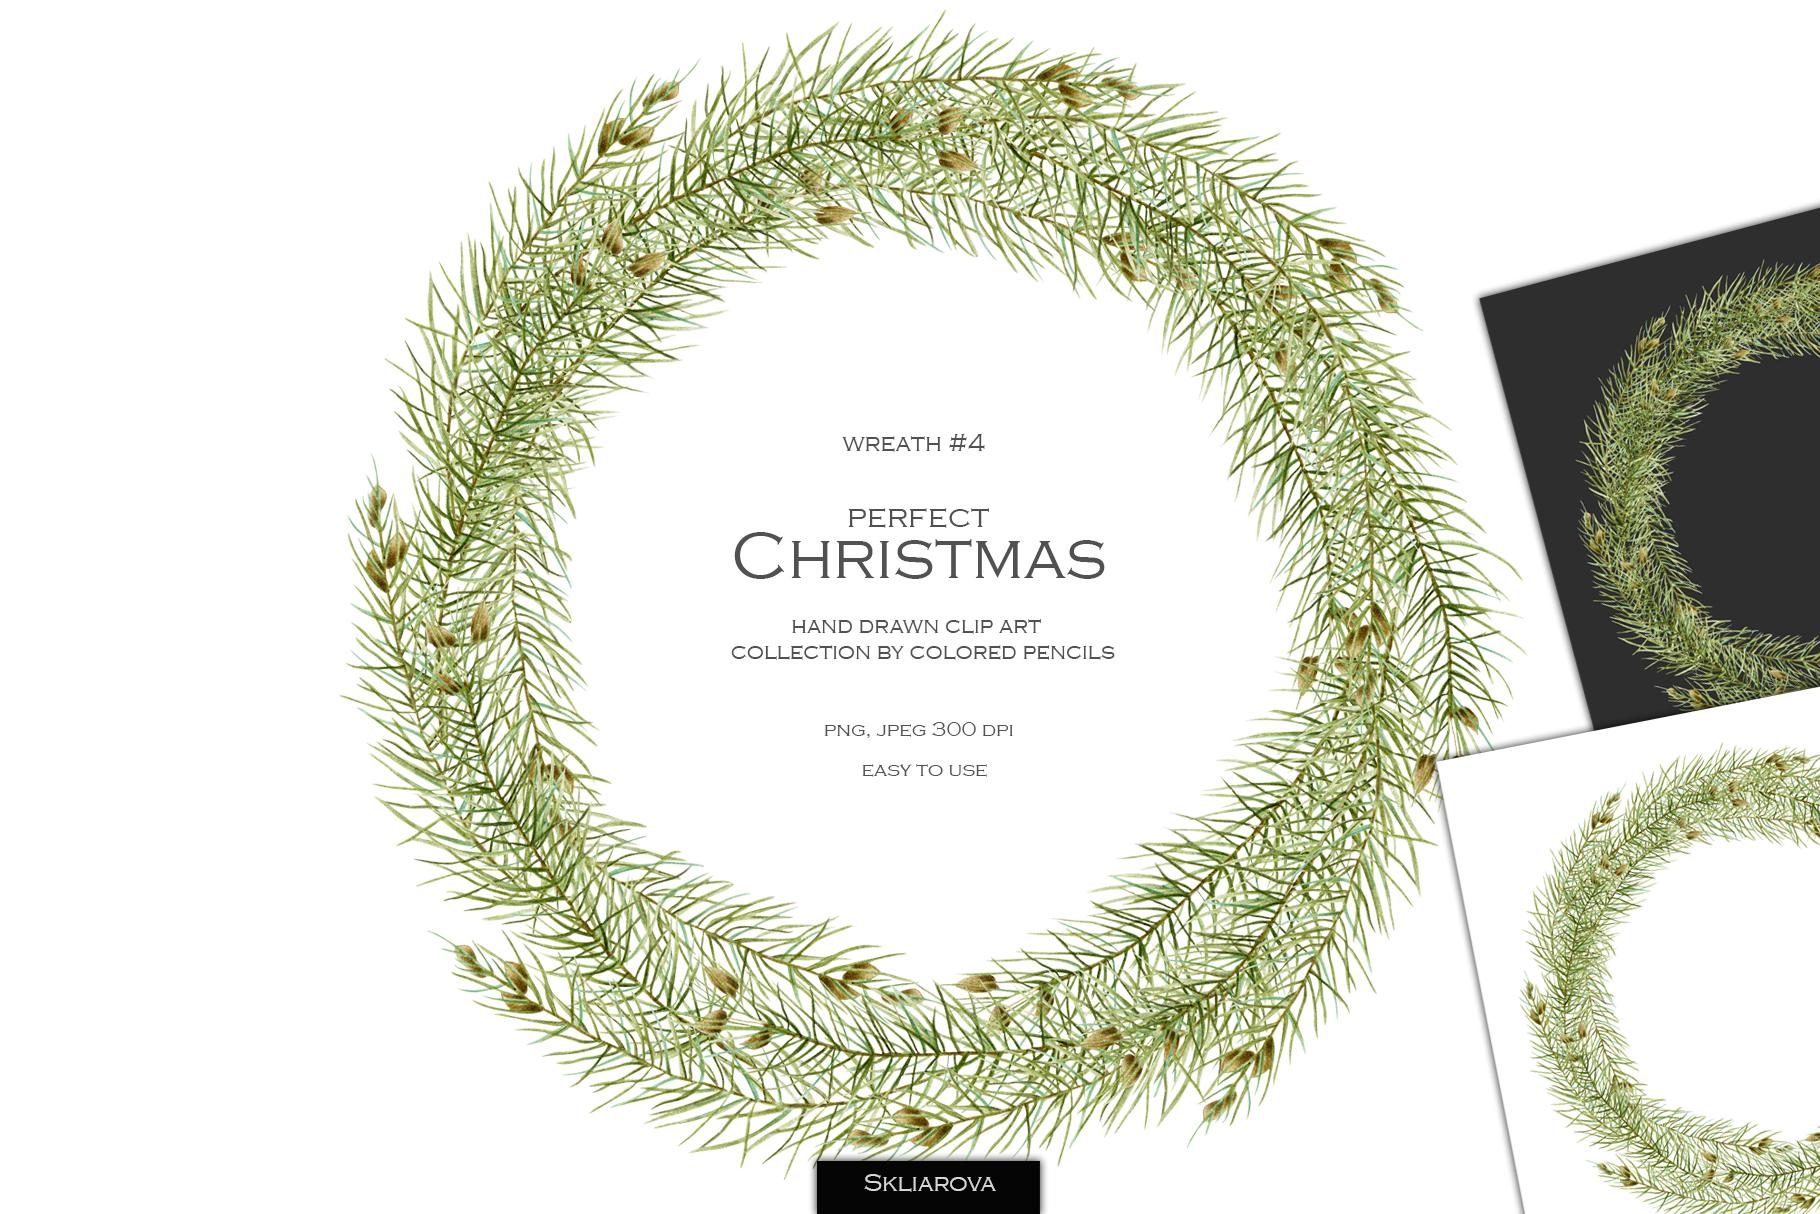 Perfect Christmas. Wreath #4 example image 1